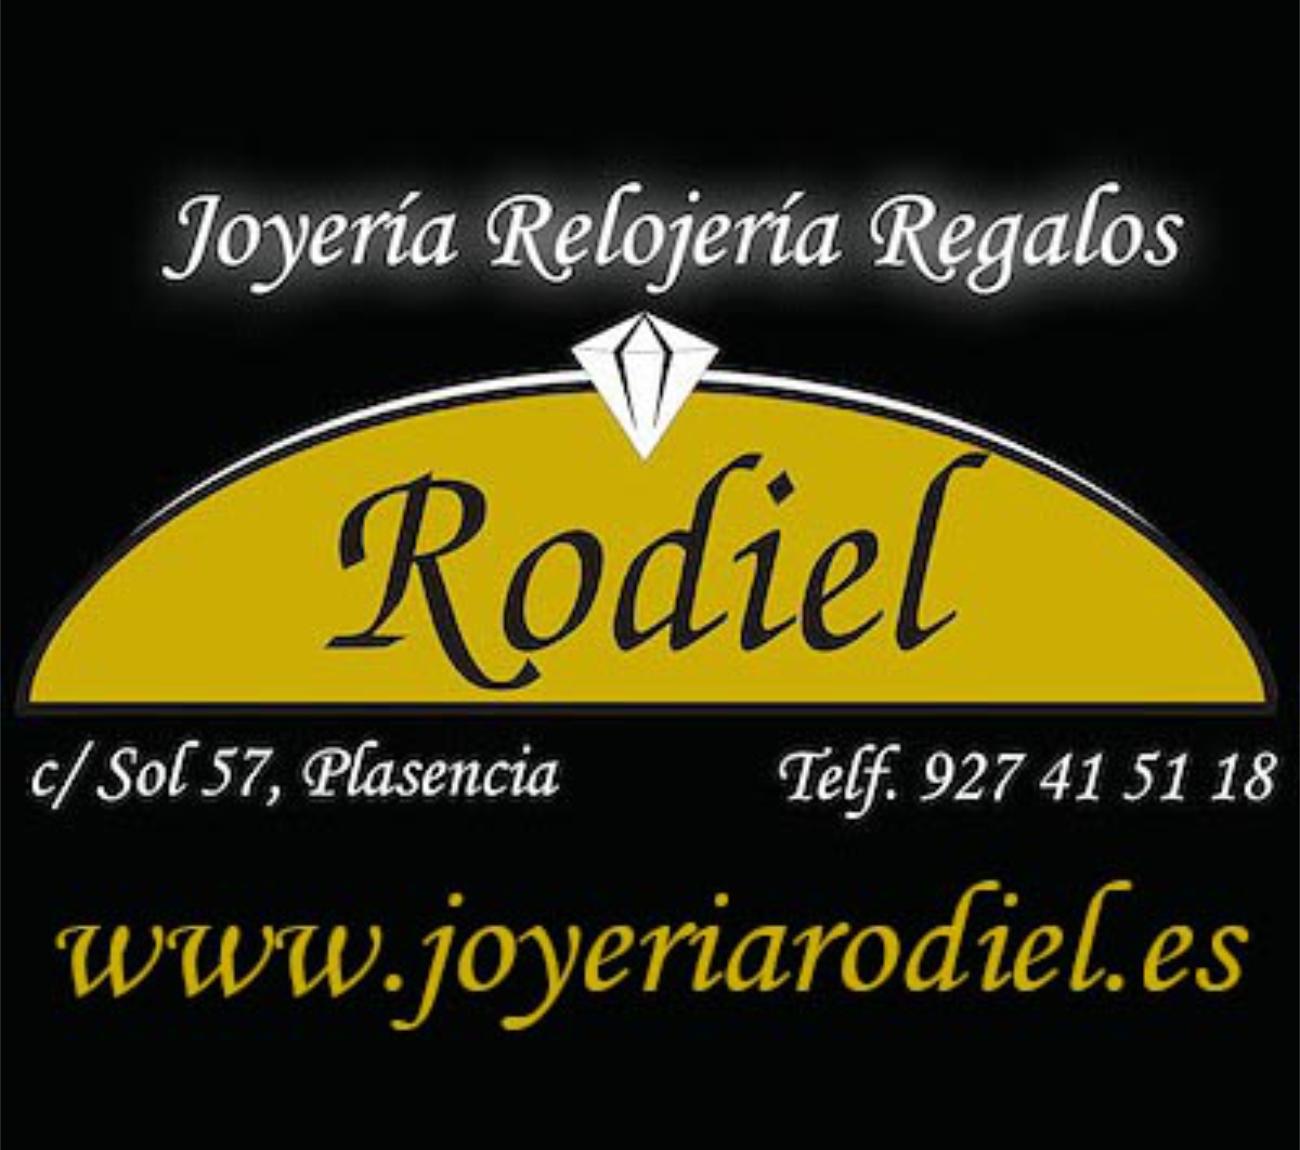 JOYERIA RODIEL